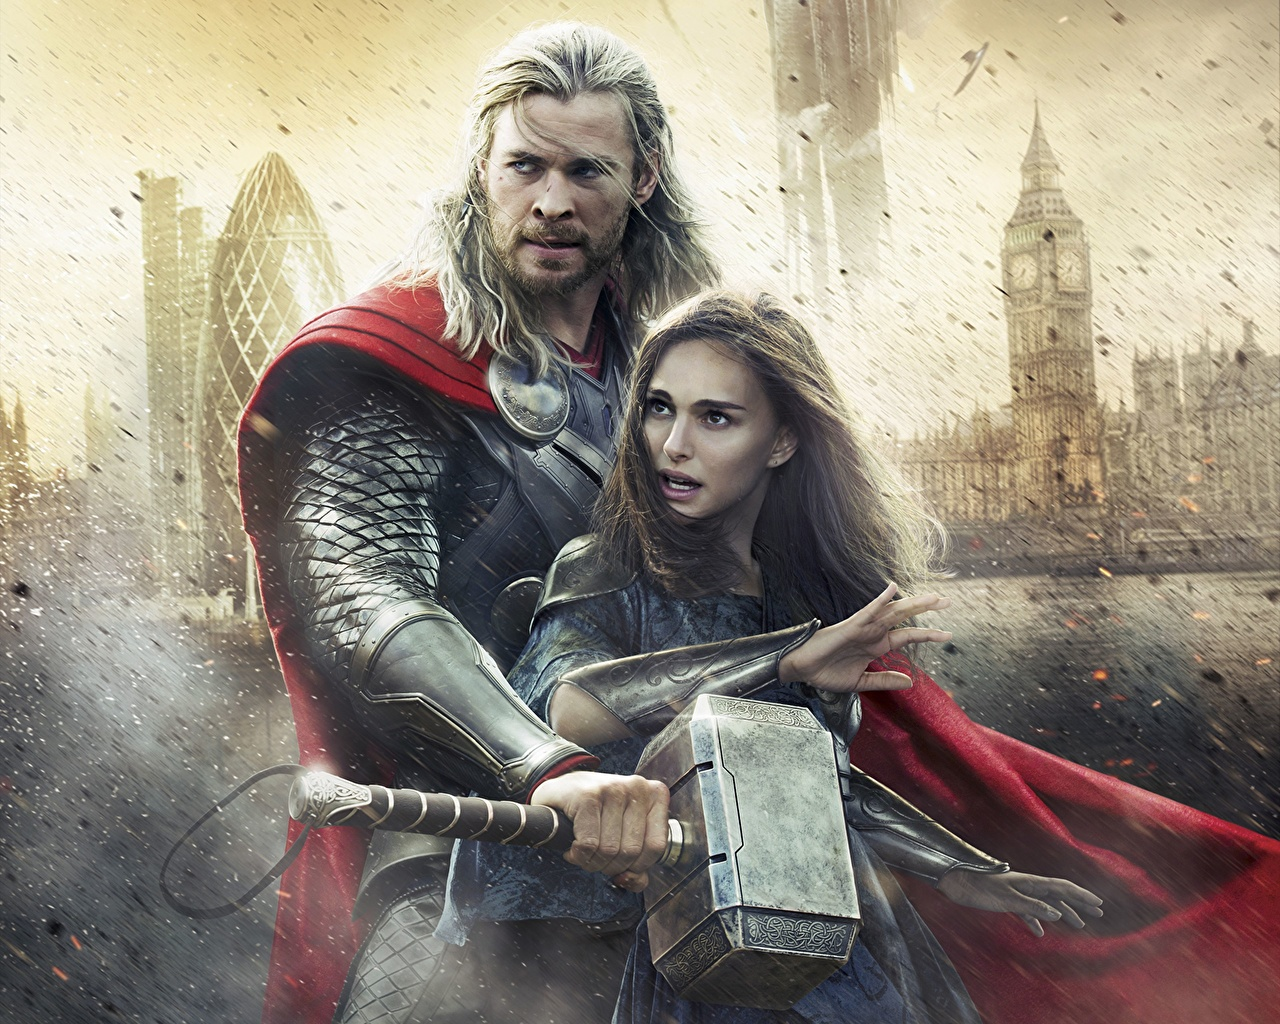 Images Thor: The Dark World Chris Hemsworth Natalie Portman Thor hero Men Warriors War hammer young woman Movies Celebrities Man warrior Girls female film